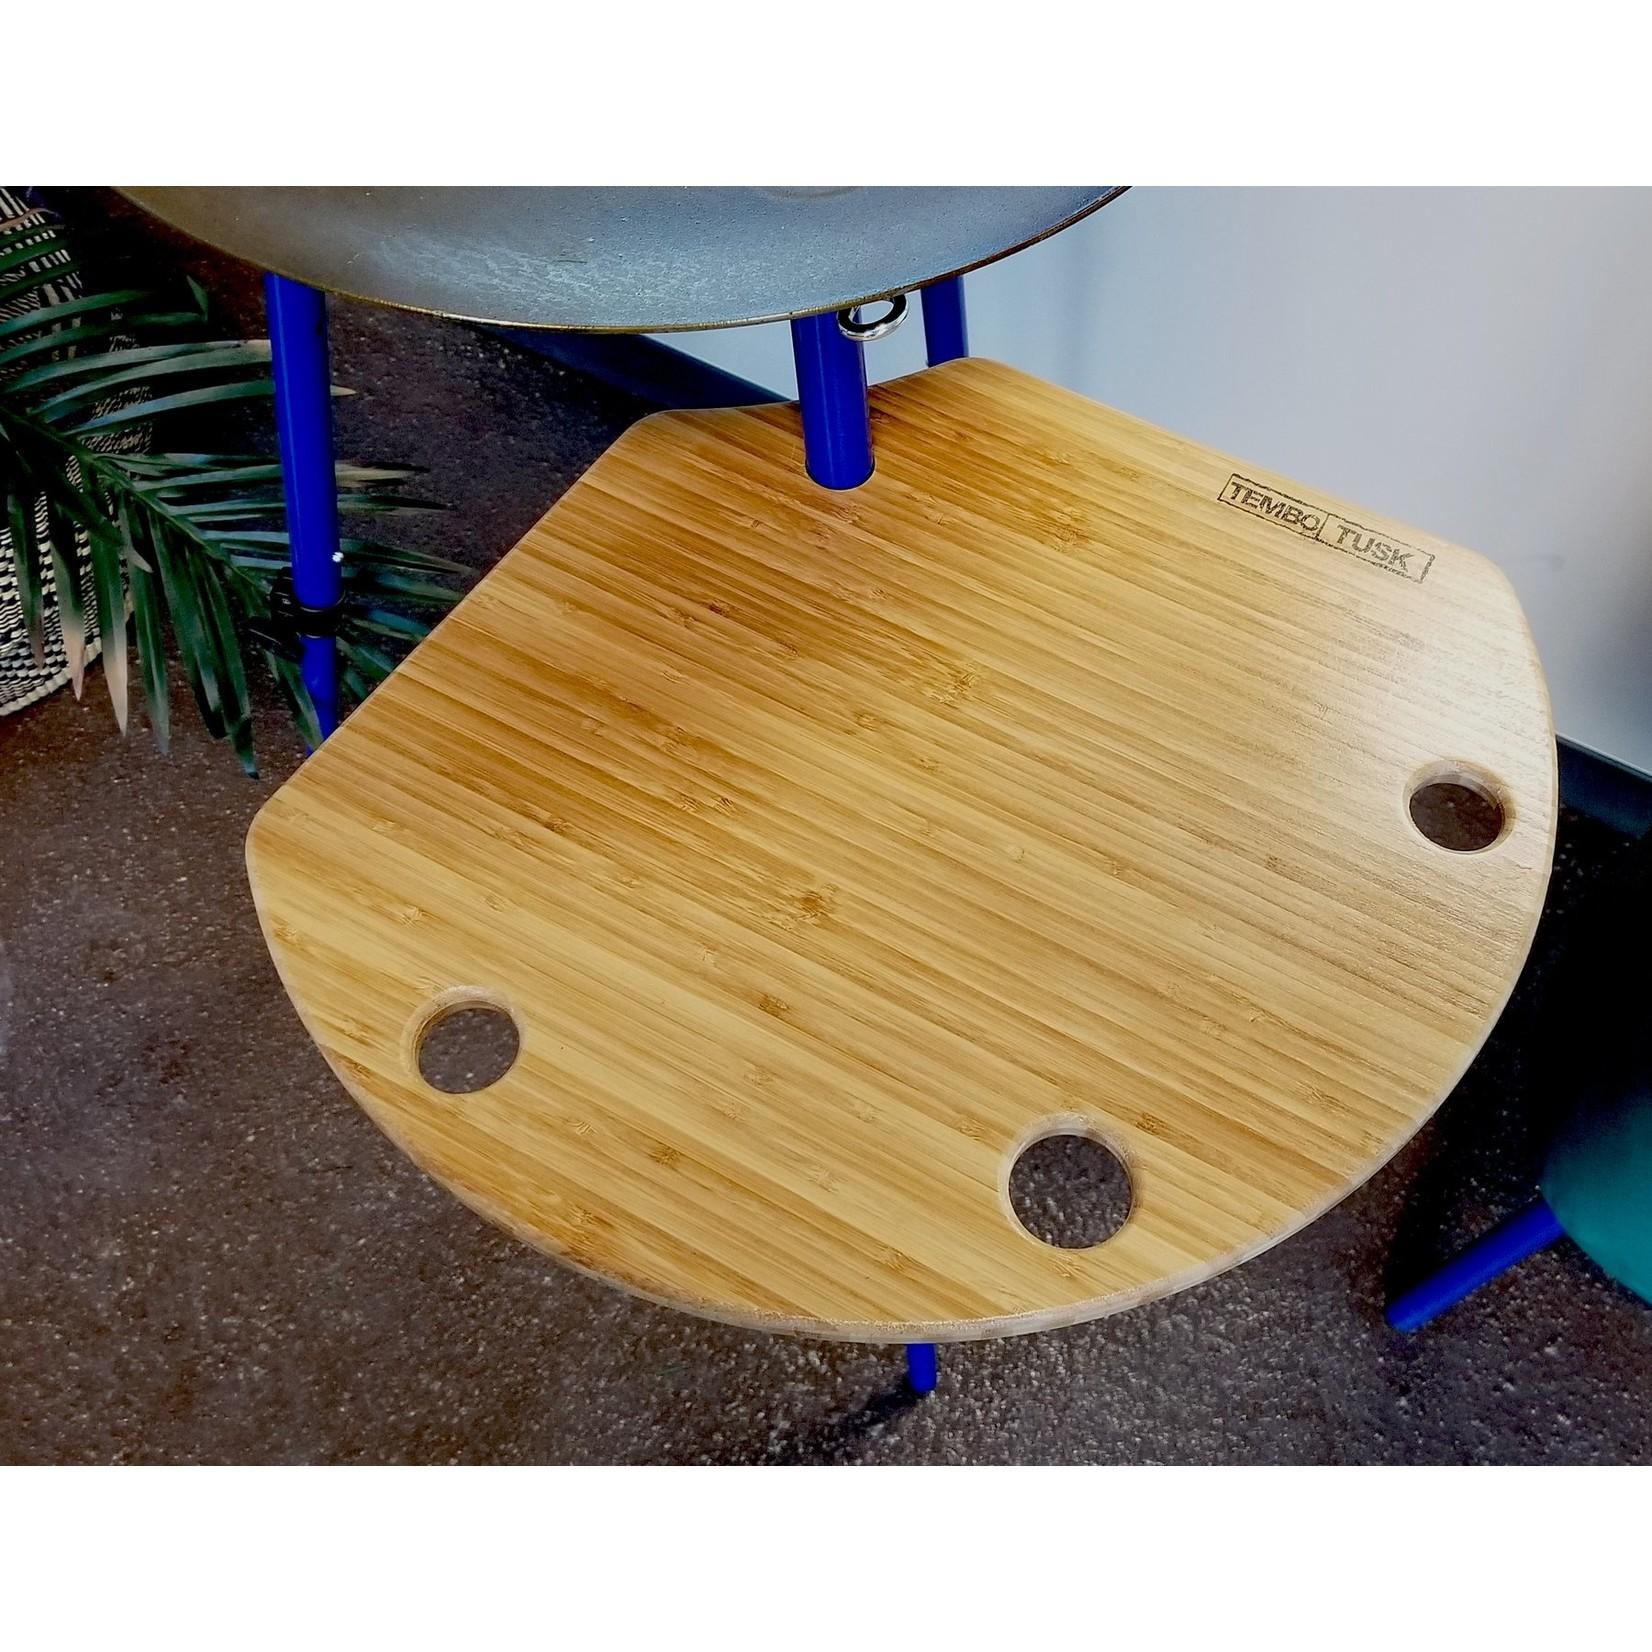 Tembo Tusk Tembo Tusk Skootle Leg Table